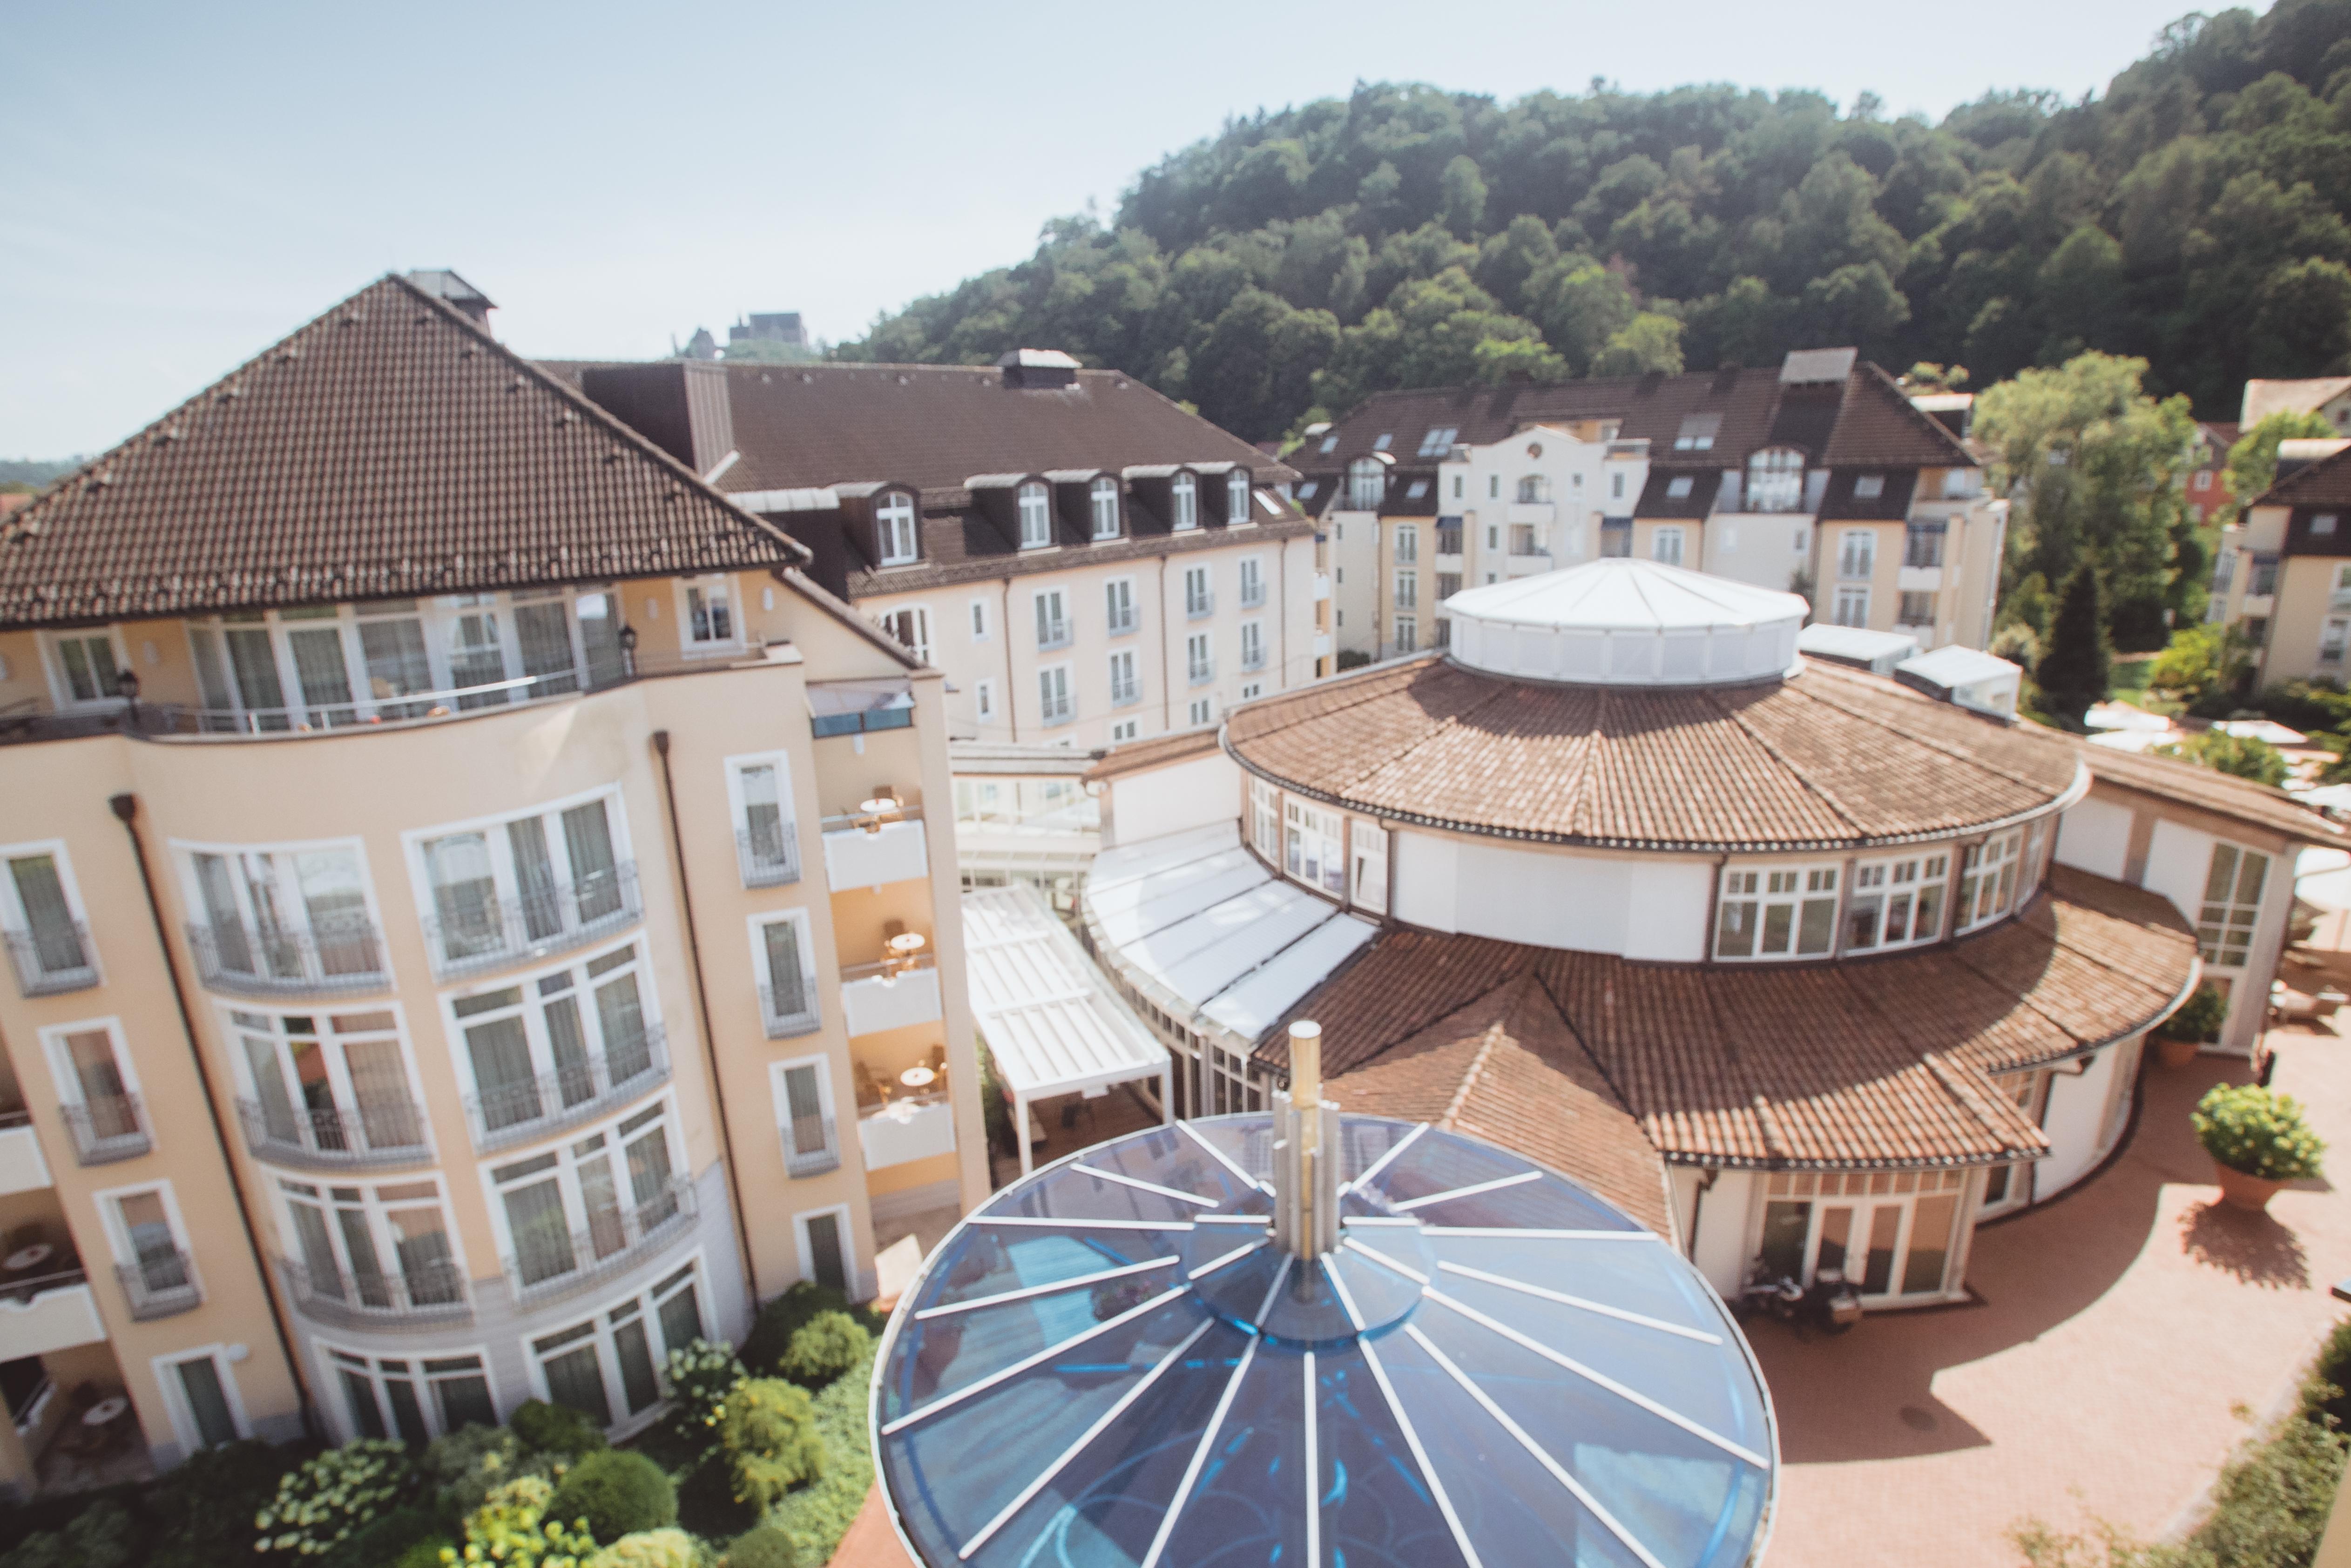 marburg_hotel-vila-vita-rosenpark_fassade